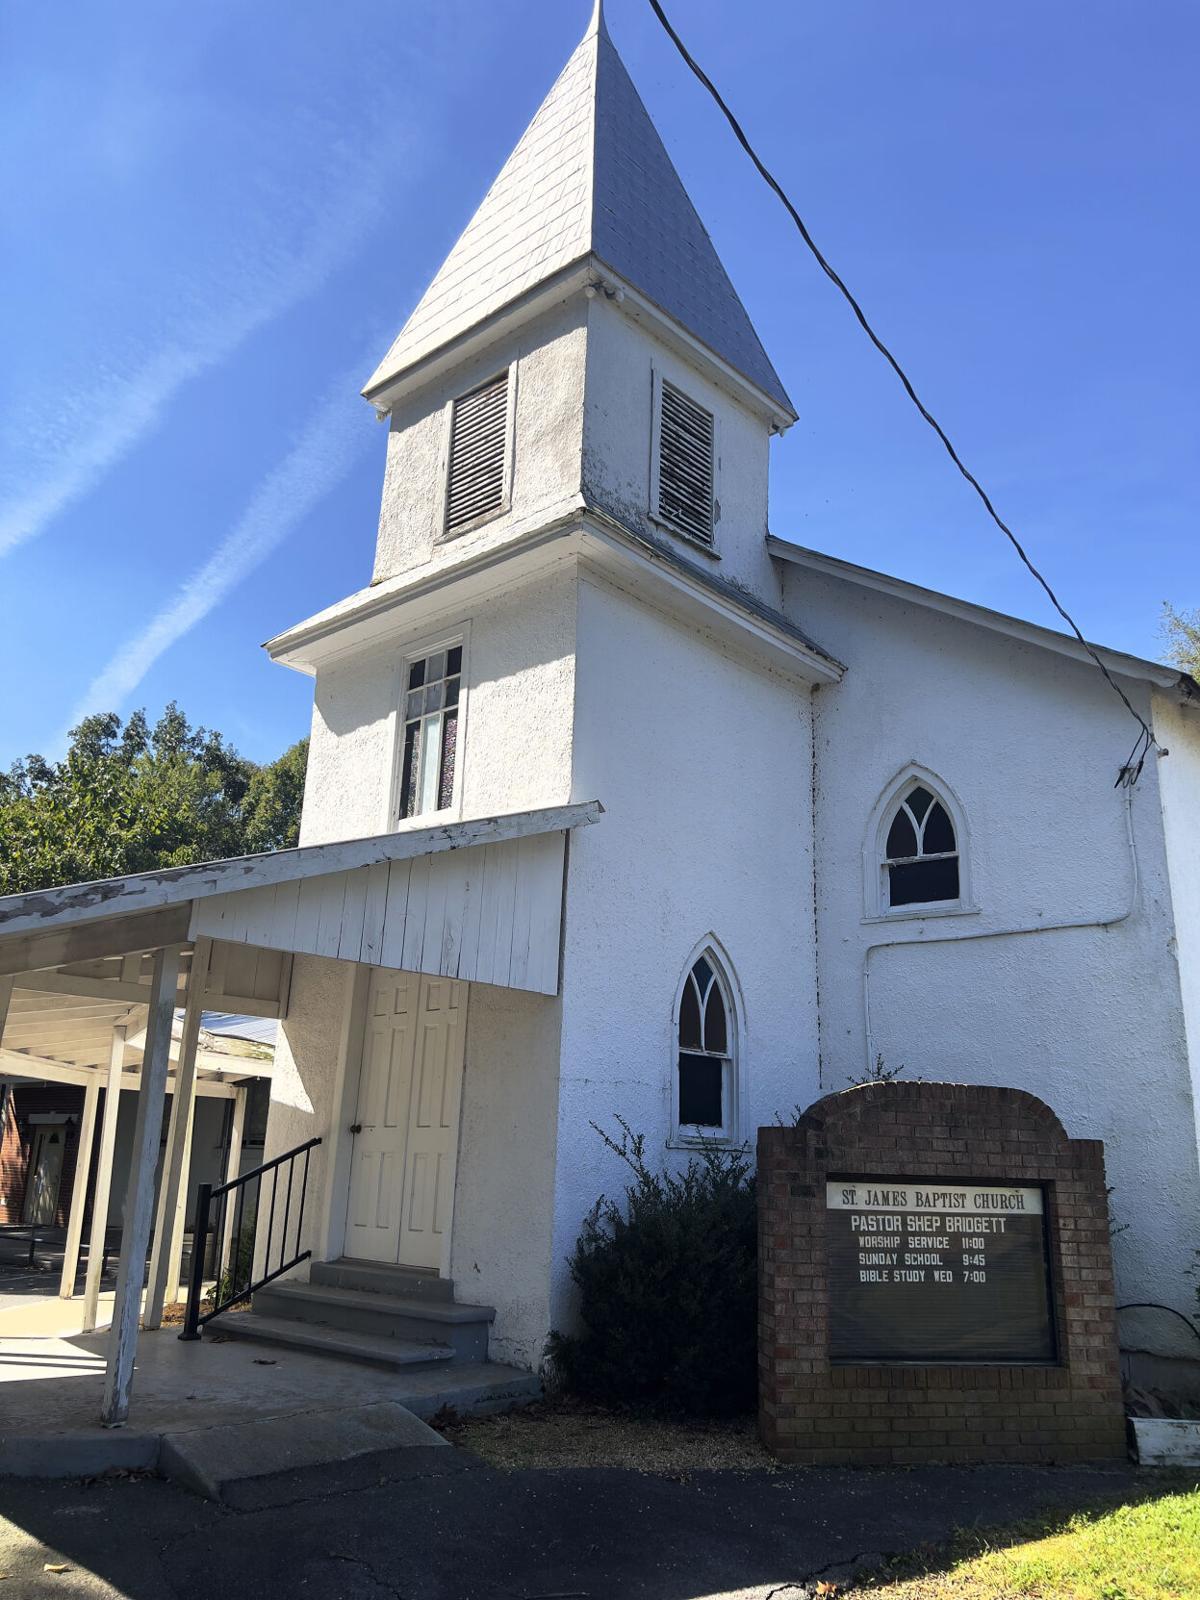 photo_ft_news_st james church_100621.jpg